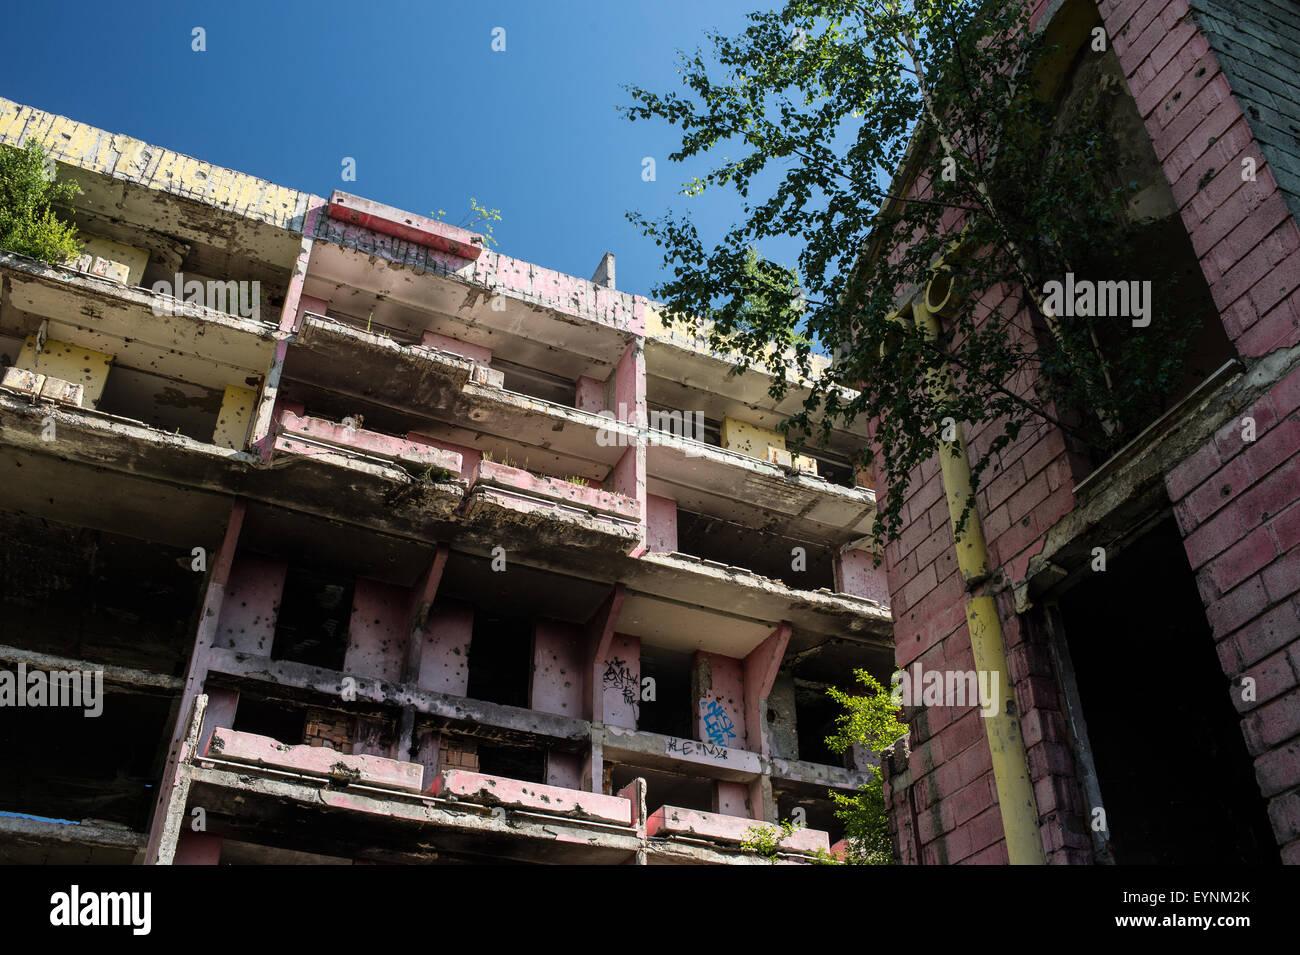 1992-95 civil war destroyed buildings, Sarajevo, Bosnia and Erzegovina - Stock Image